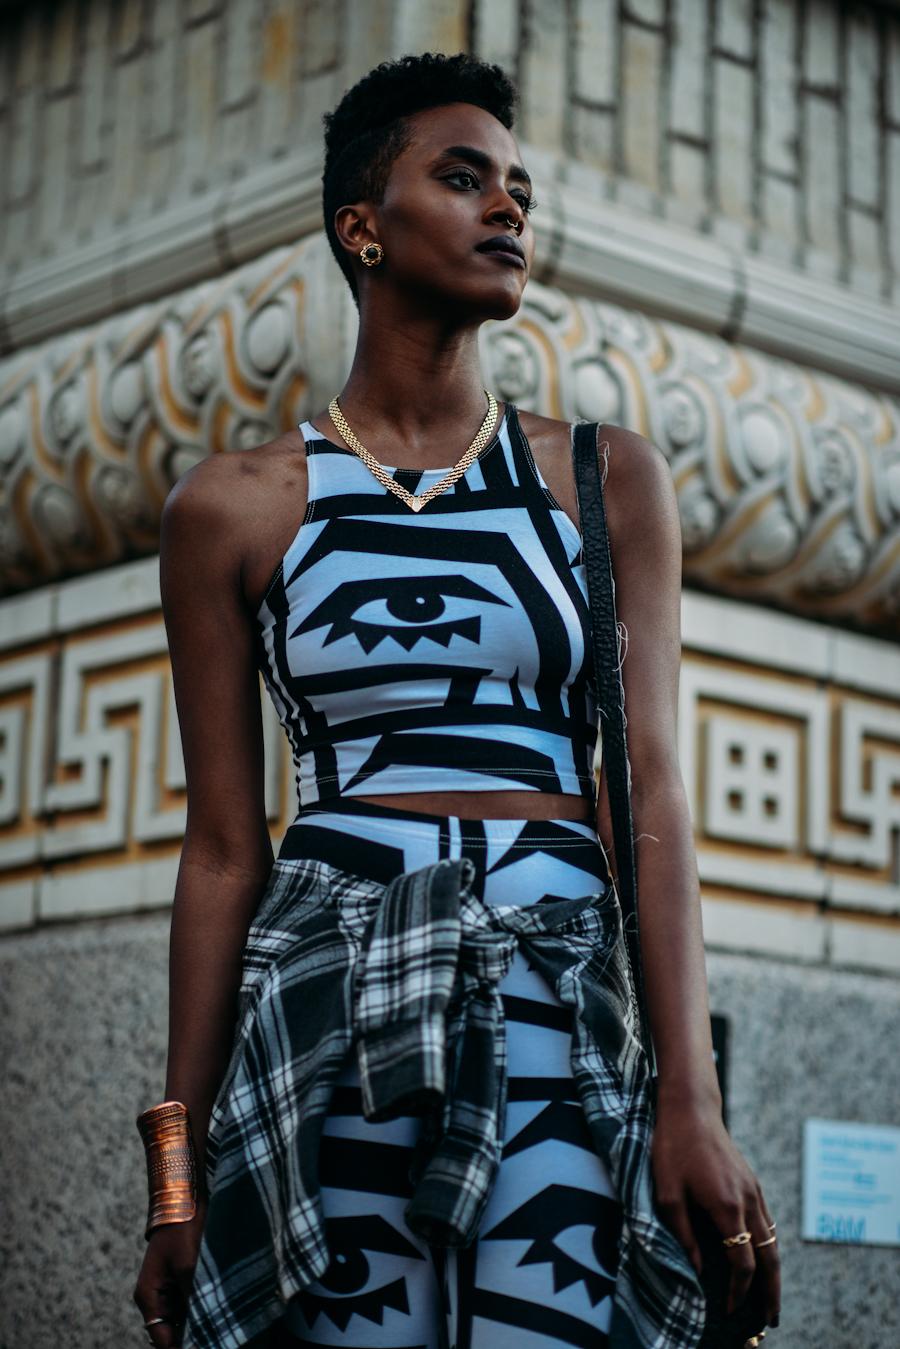 Dapper-Lou-Dance-Africa-Print-Menwear-Blog.jpg